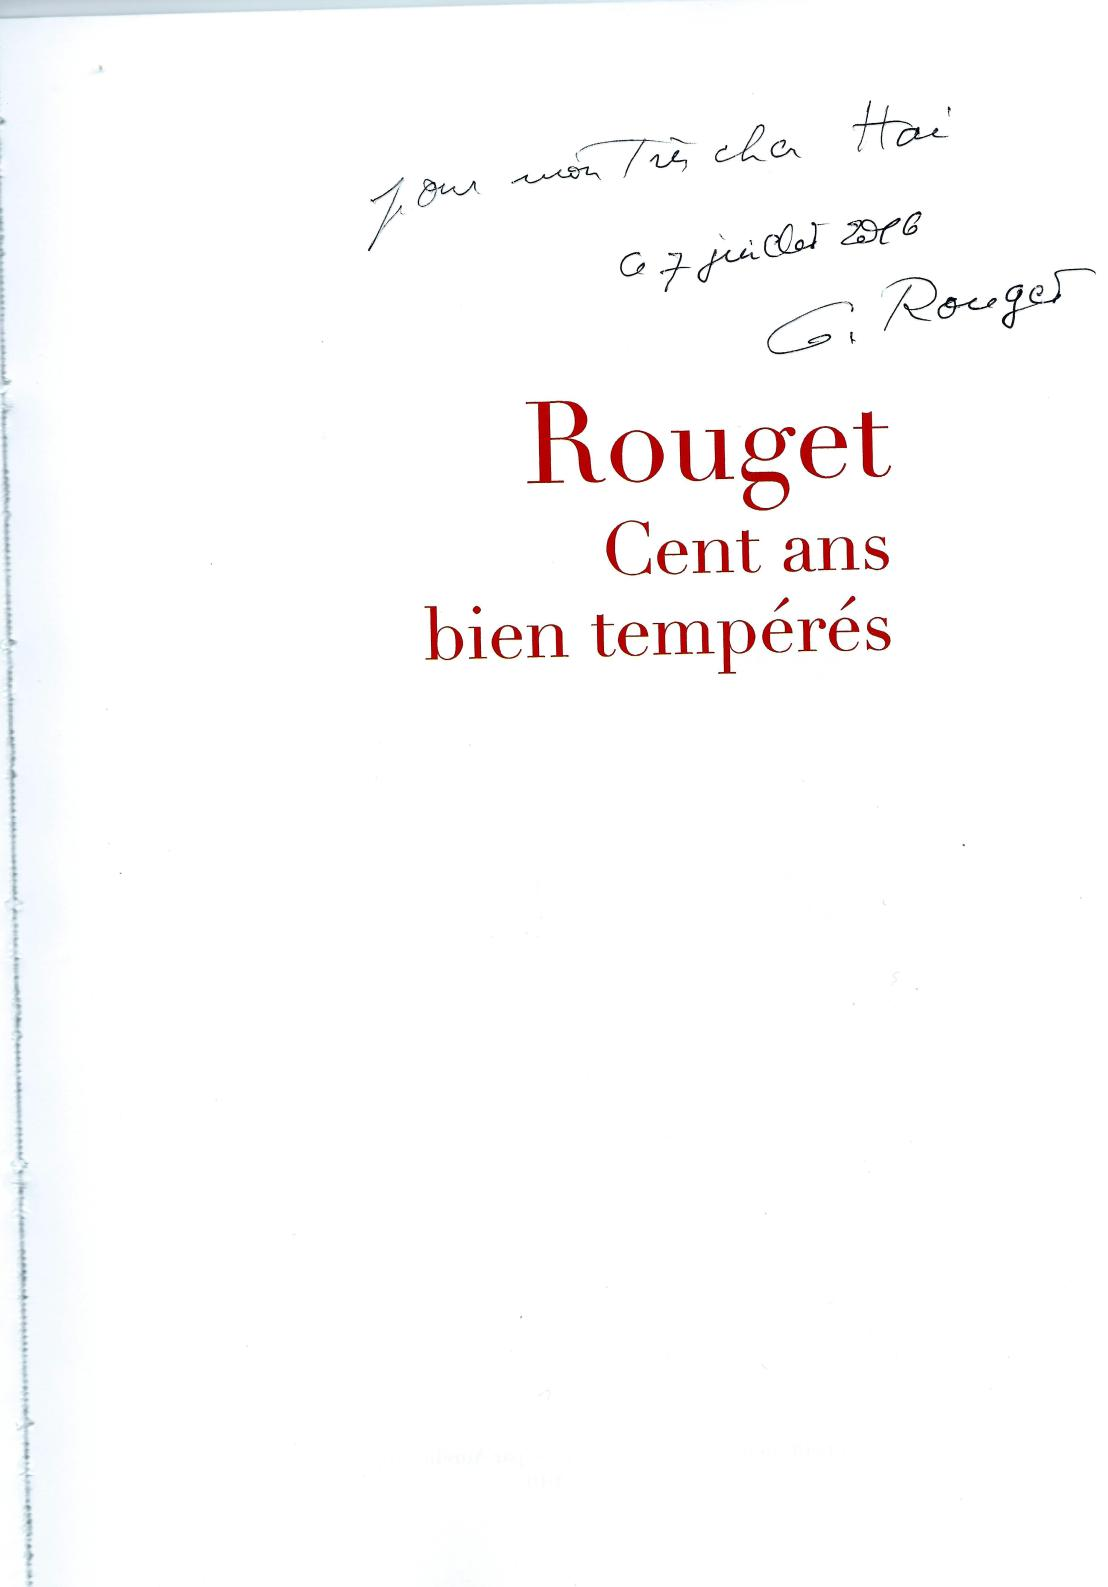 album 100 ans anniversaire G.Rouget 9.7.2016.jpg DEDICACE.jpg